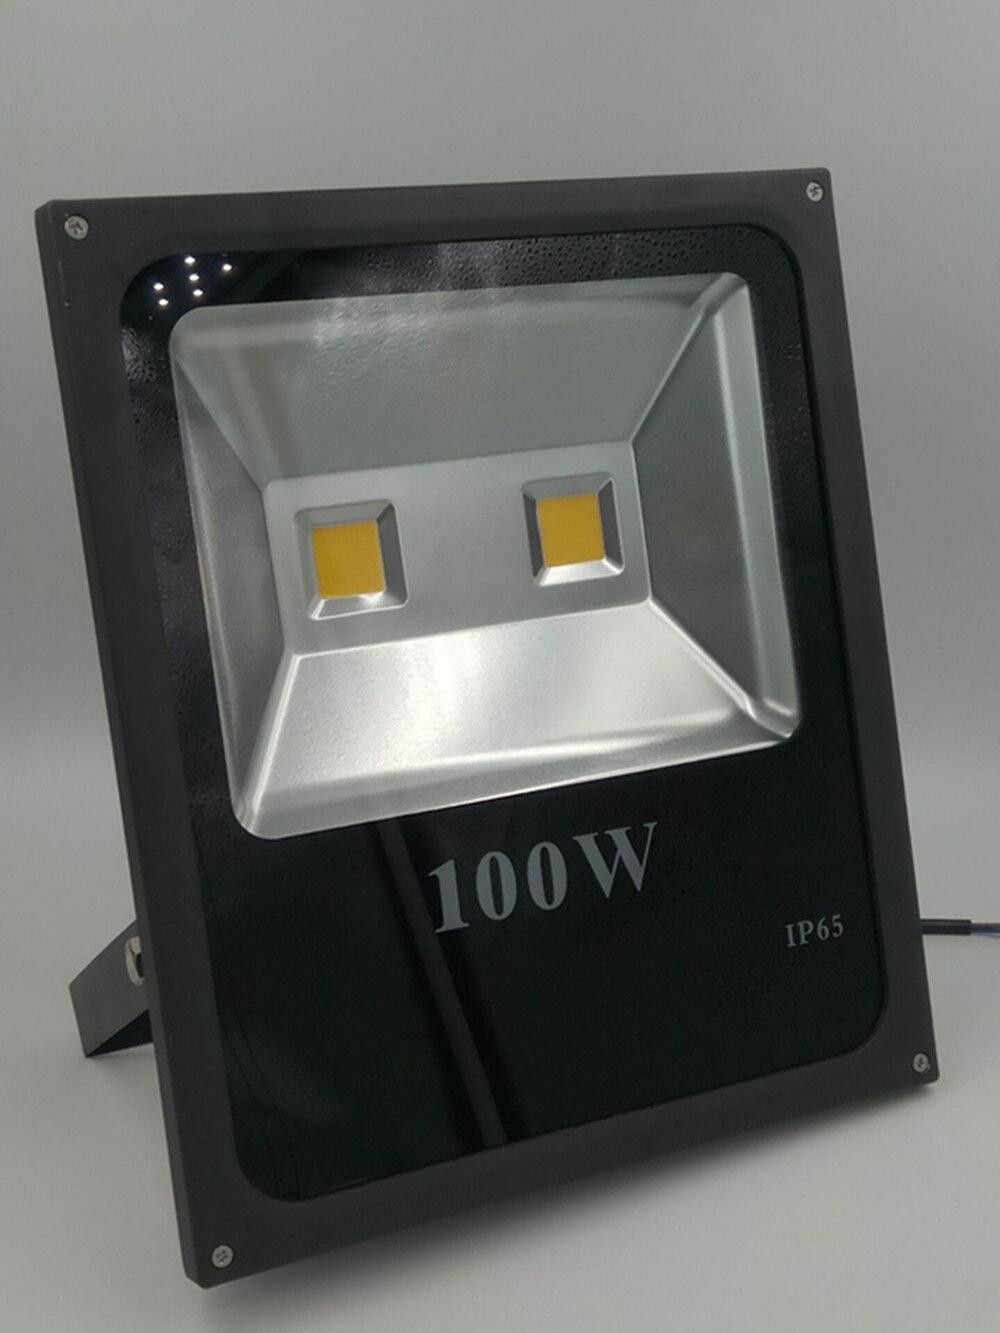 Waterproof LED Flood Light 100w 220V 240V Projecteur Foco Led Floodlight Refletor Spotlight Outdoor Exterieur